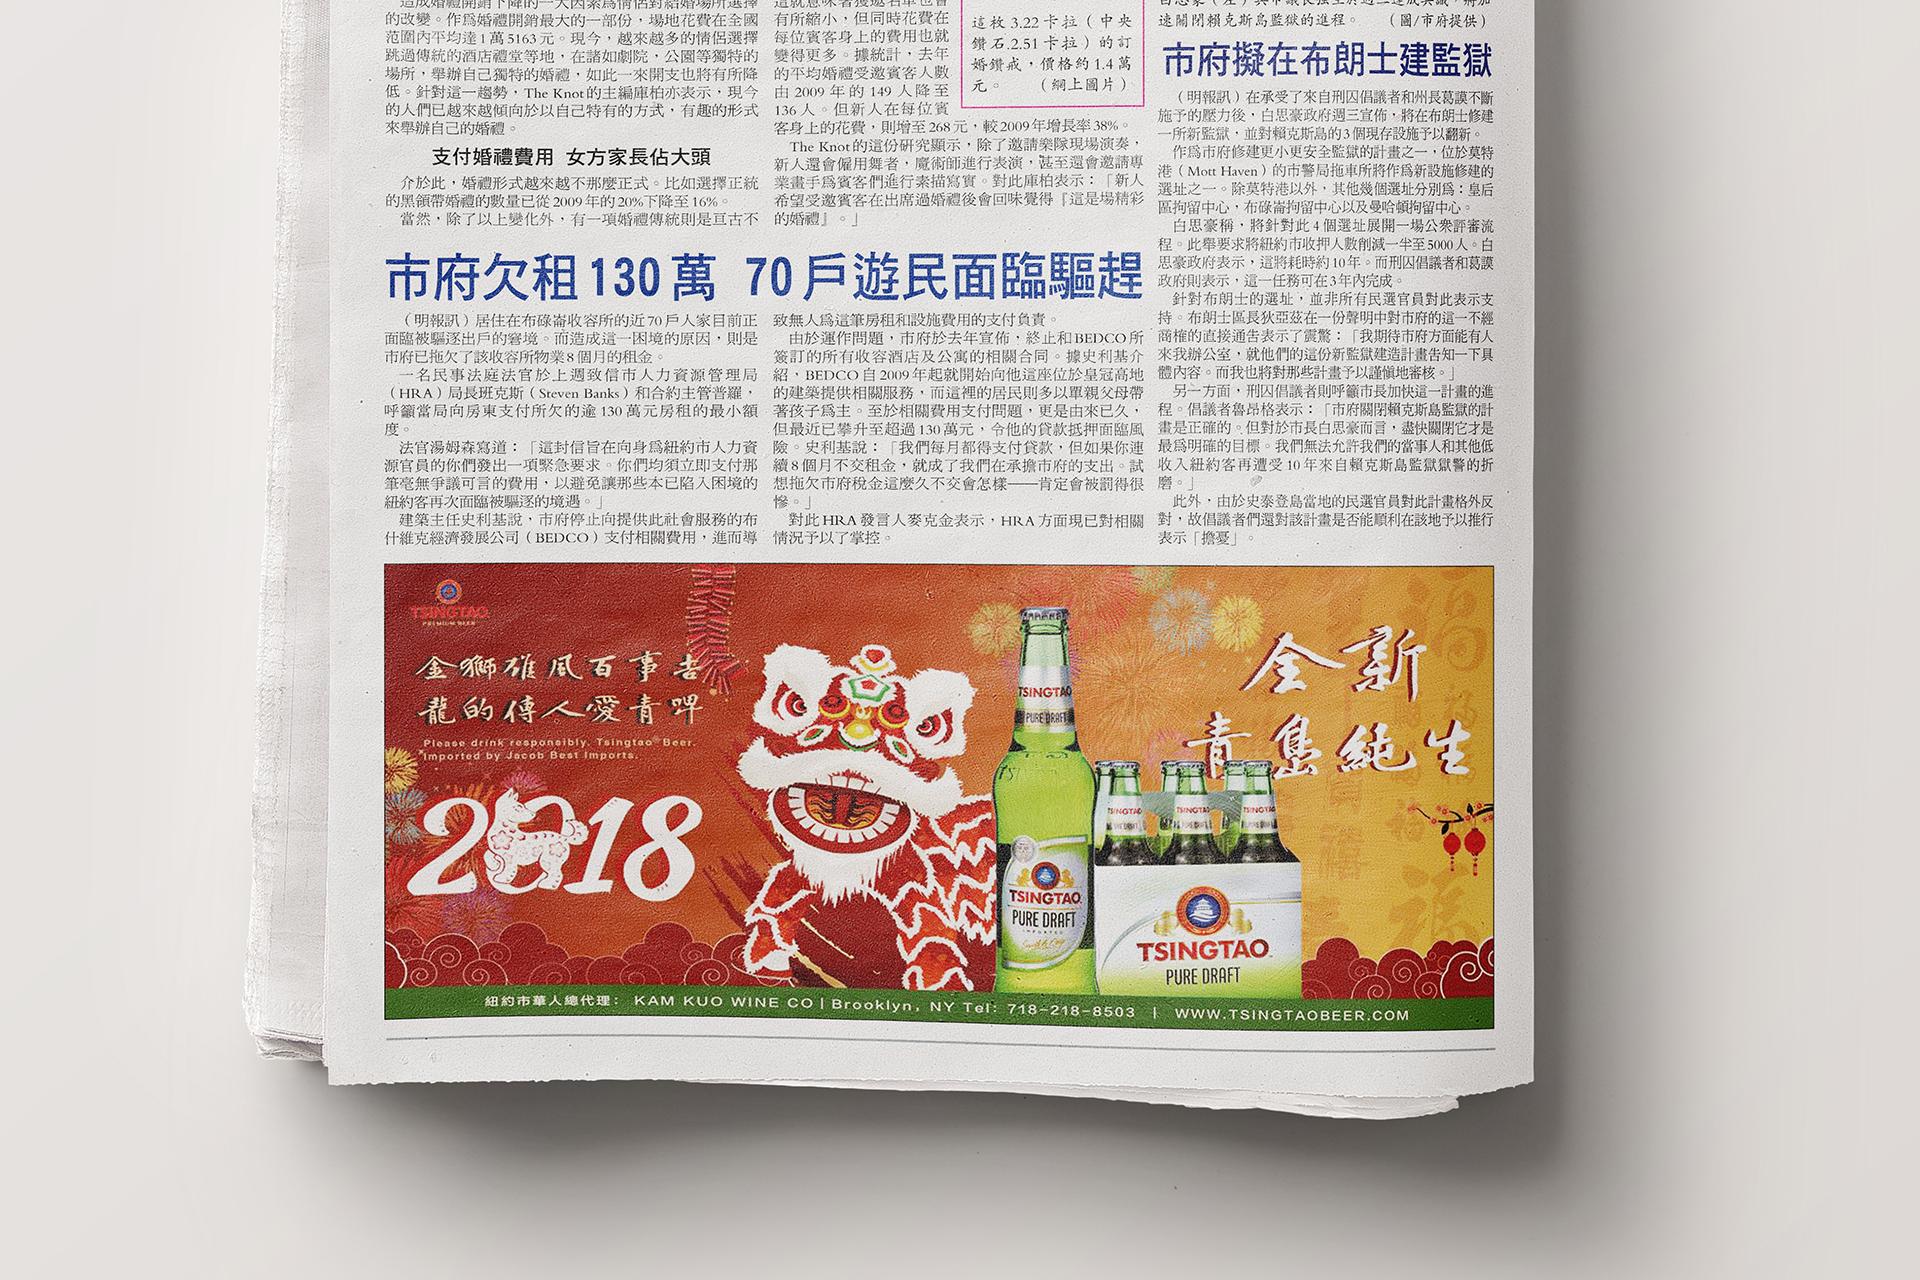 Tsingtao_Overice7.jpg